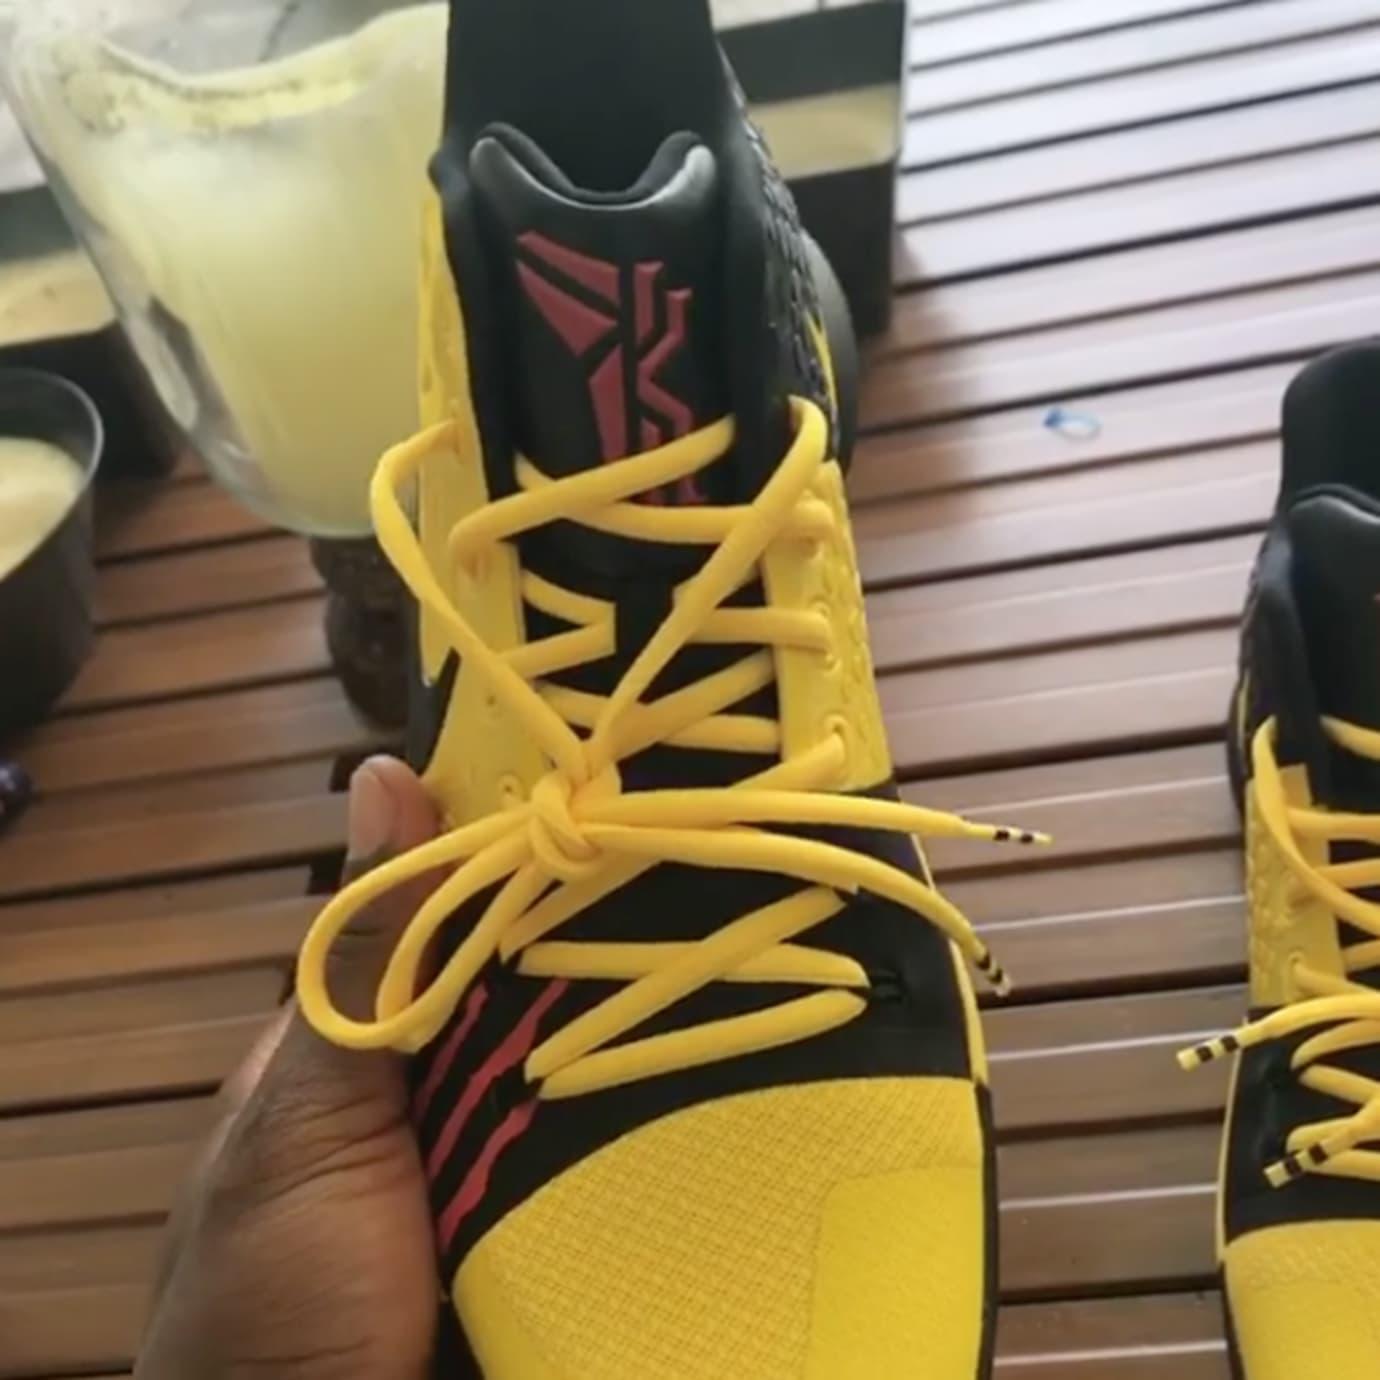 premium selection 2c53c cef3a Image via Kyrie Irving on Instagram Bruce Lee Nike Kyries